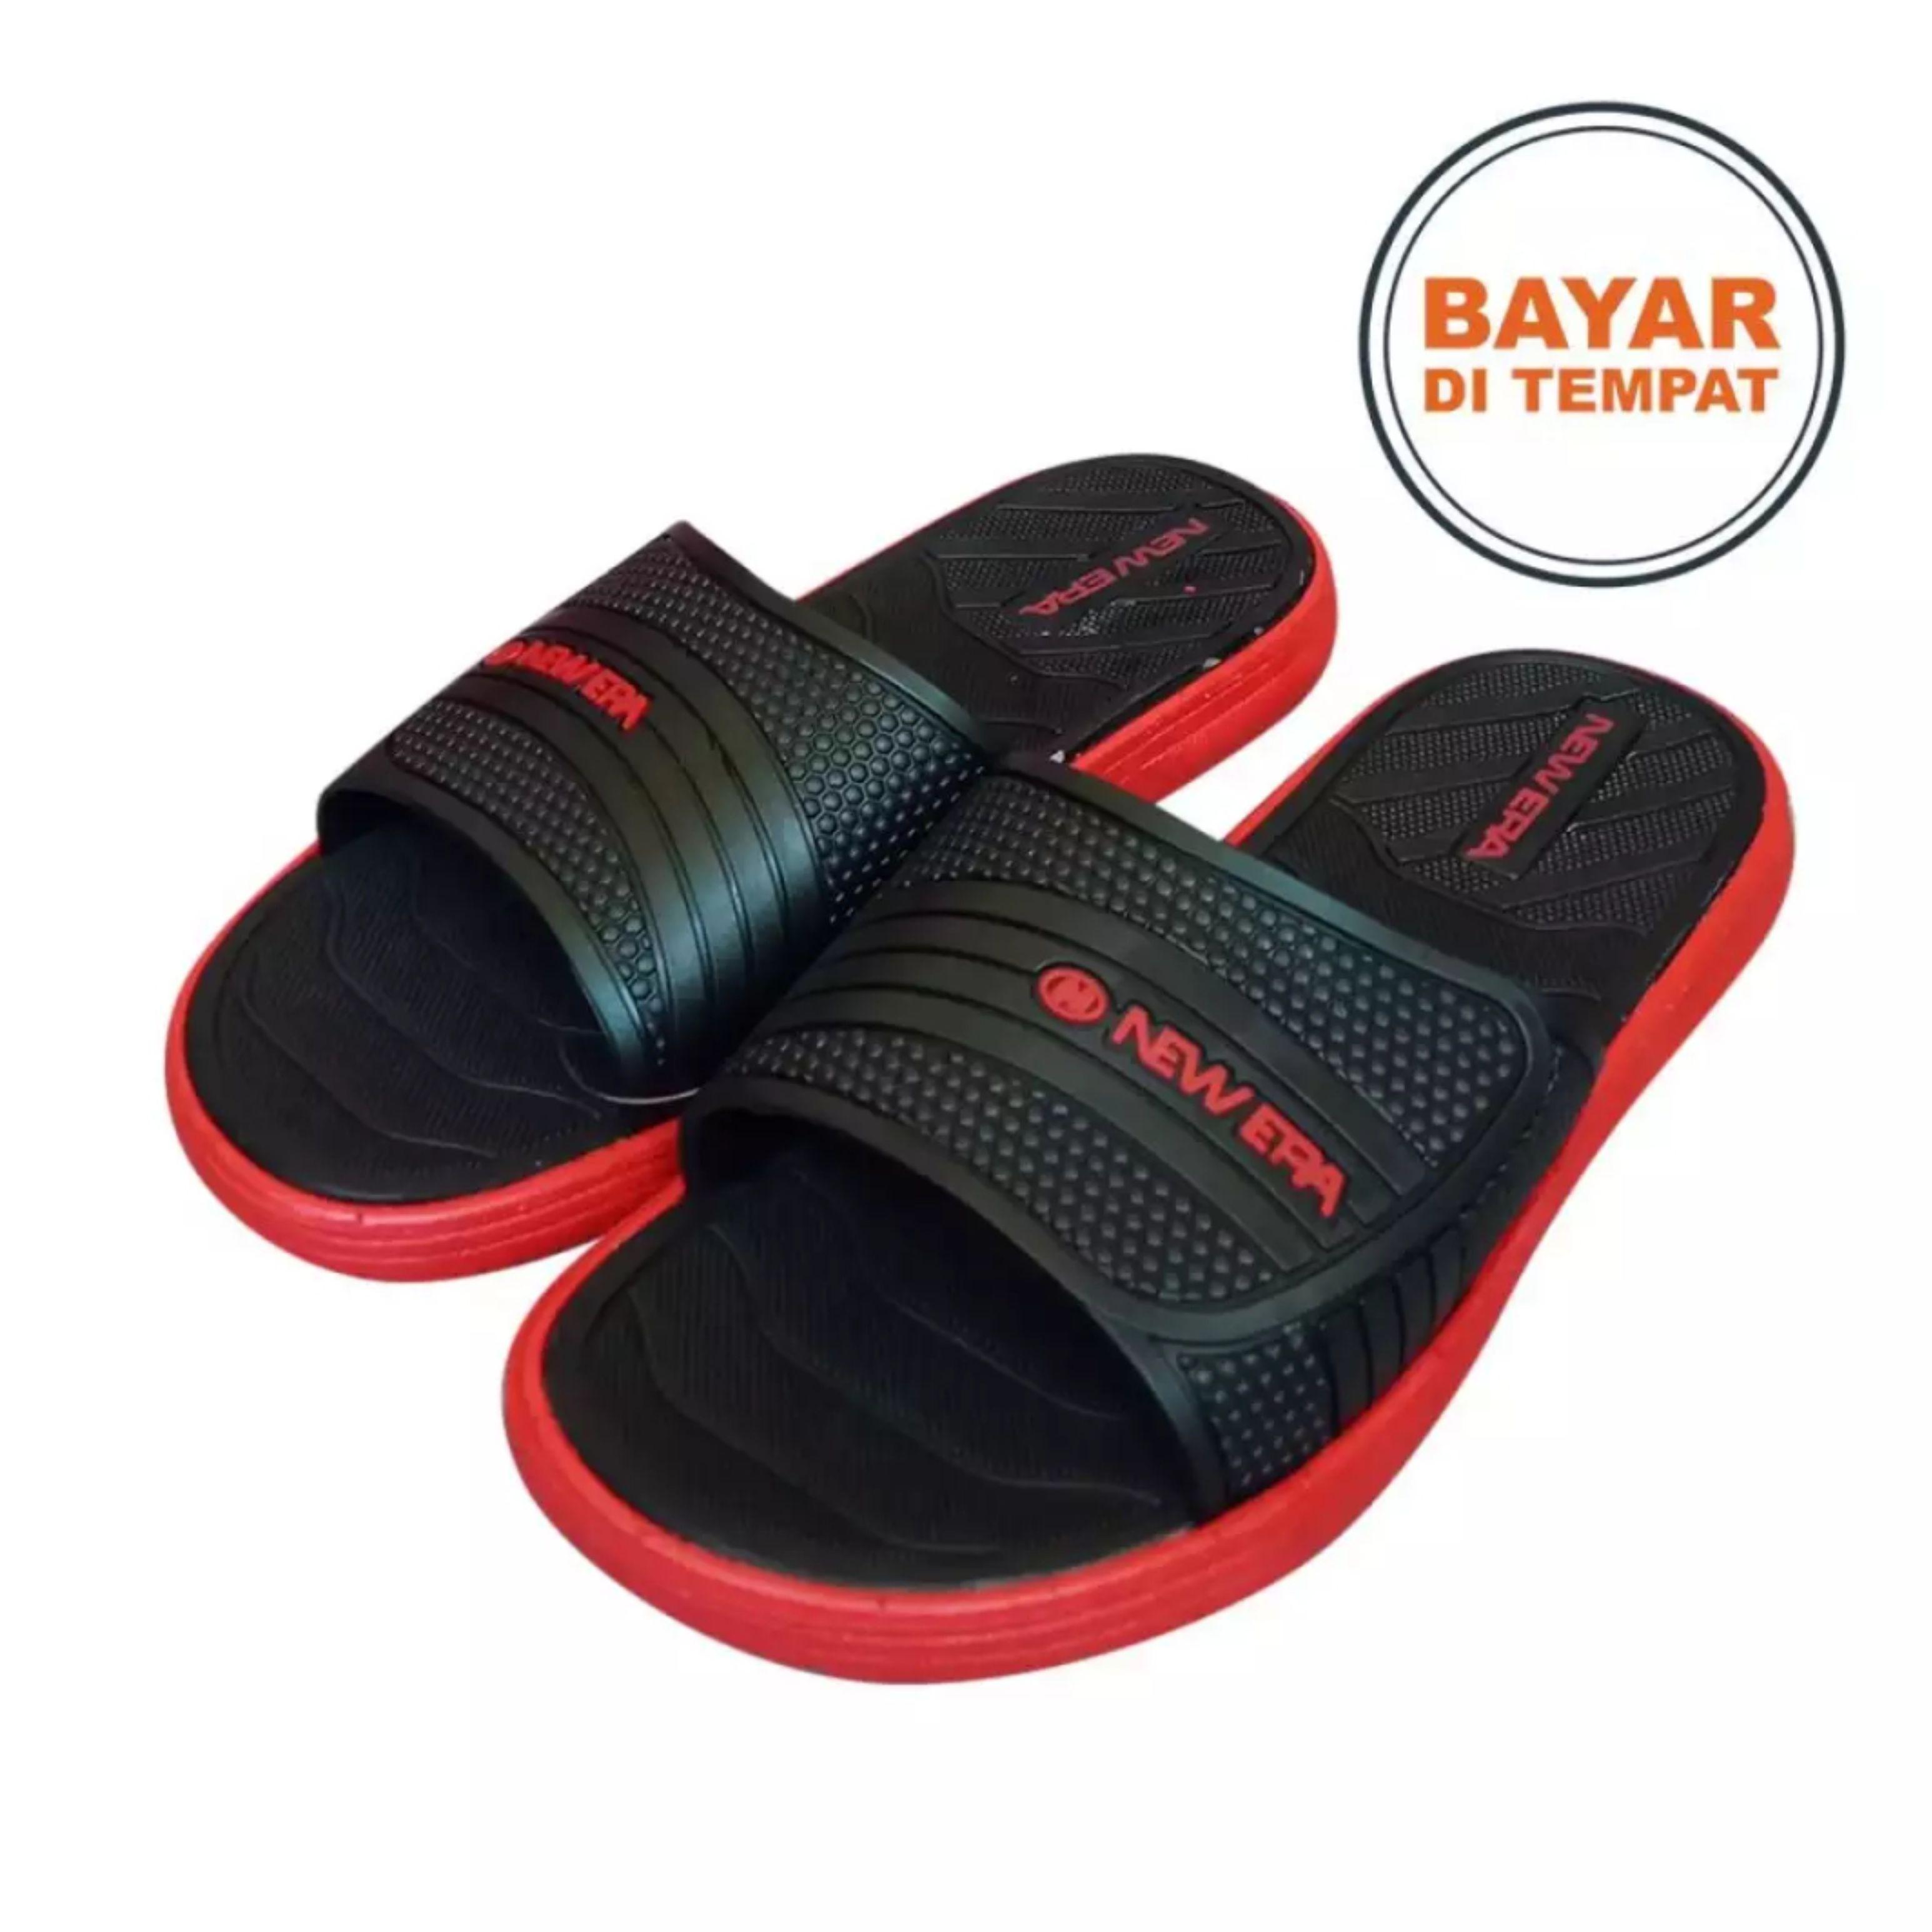 Jual Sandal Pria New Era Terbaru Lazada Co Id